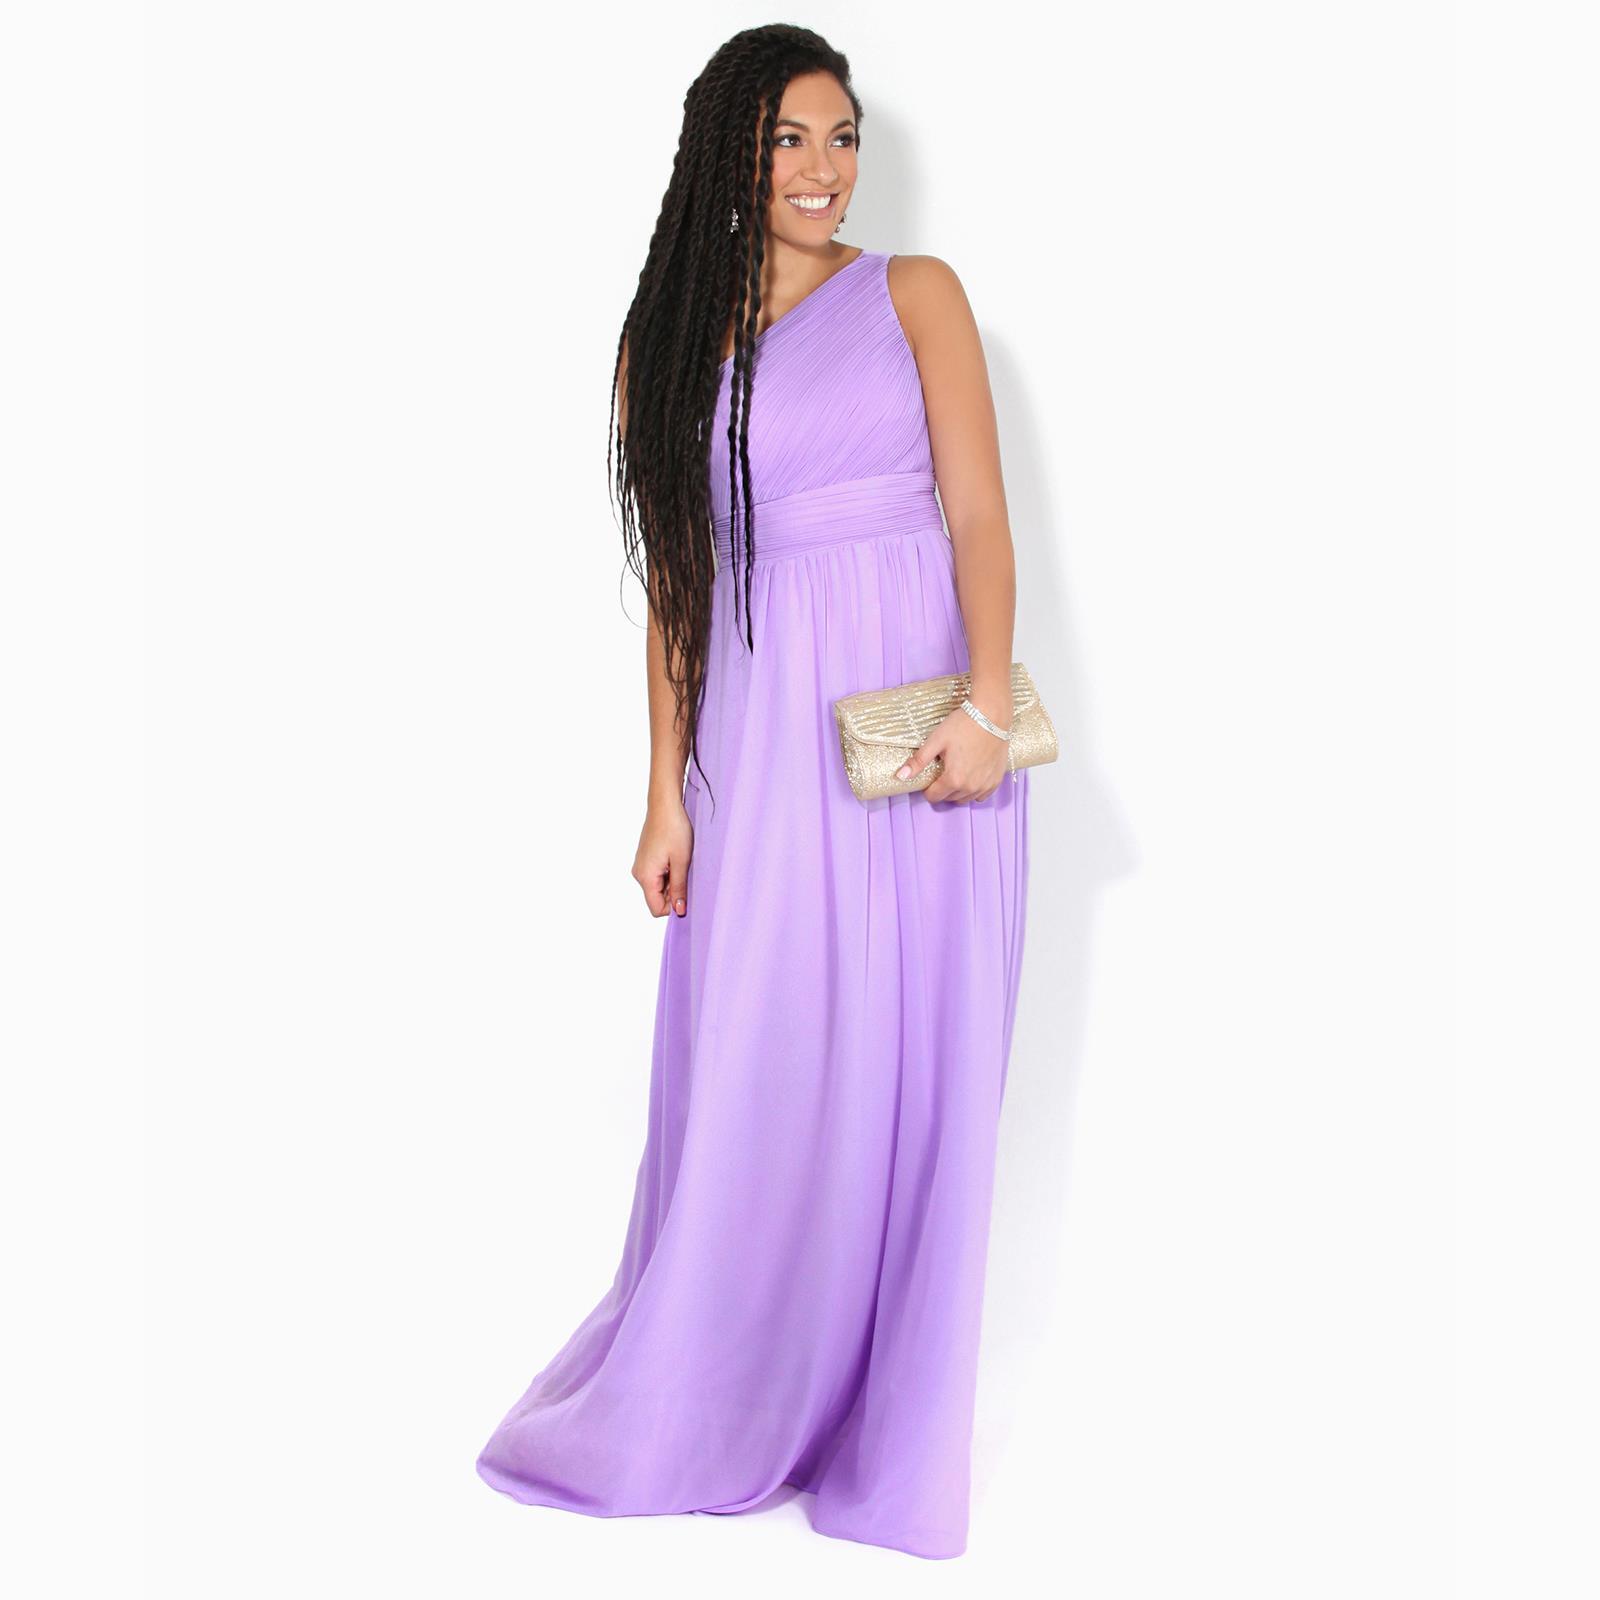 Womens-Wedding-Bridesmaid-Prom-Dress-Formal-One-Off-Shoulder-Long-Evening-8-18 thumbnail 32